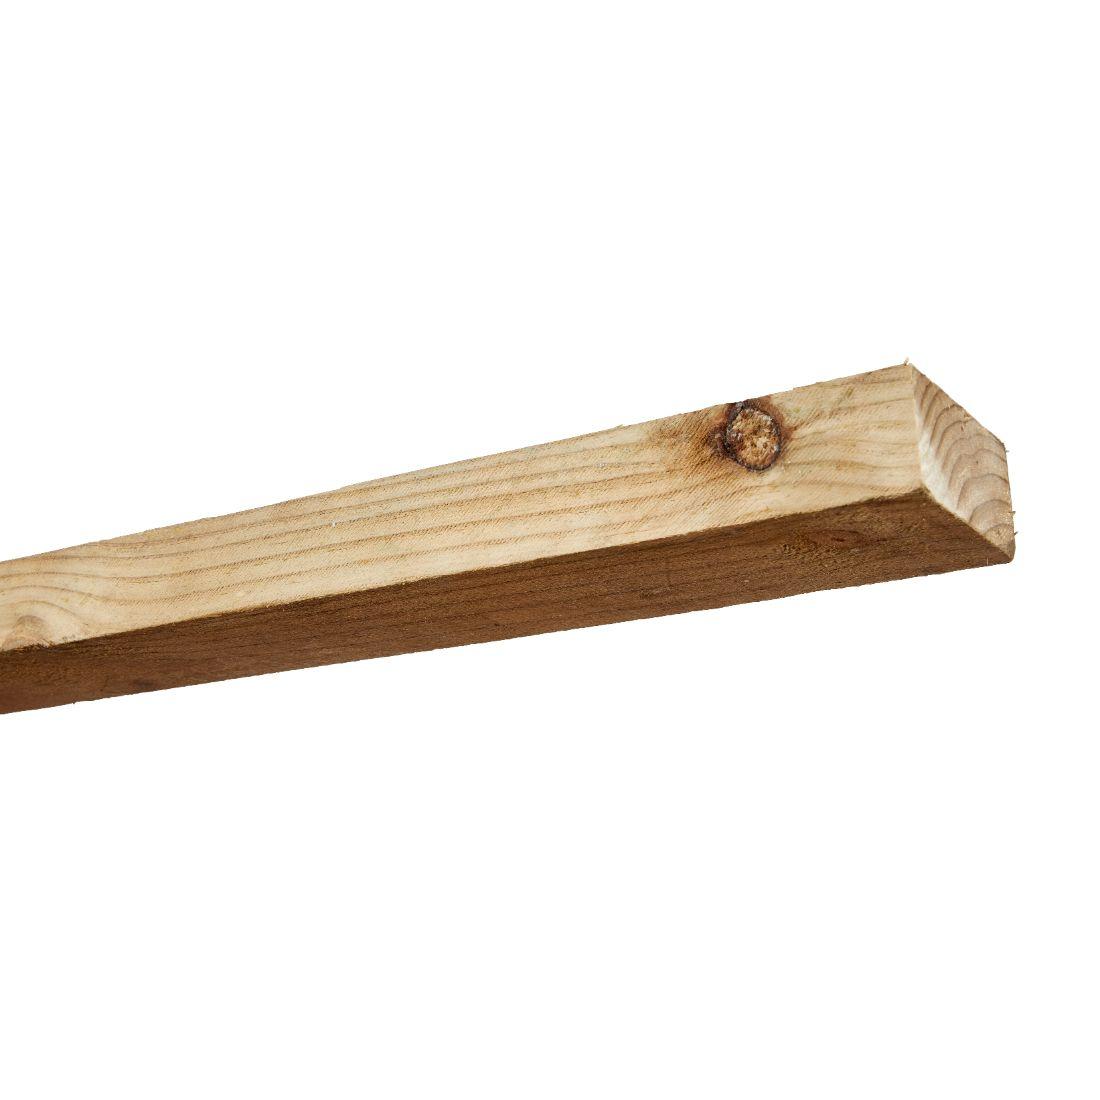 Radiata Rough Sawn No.2 Grade Timber H3.2 Treated 100 x 50mm